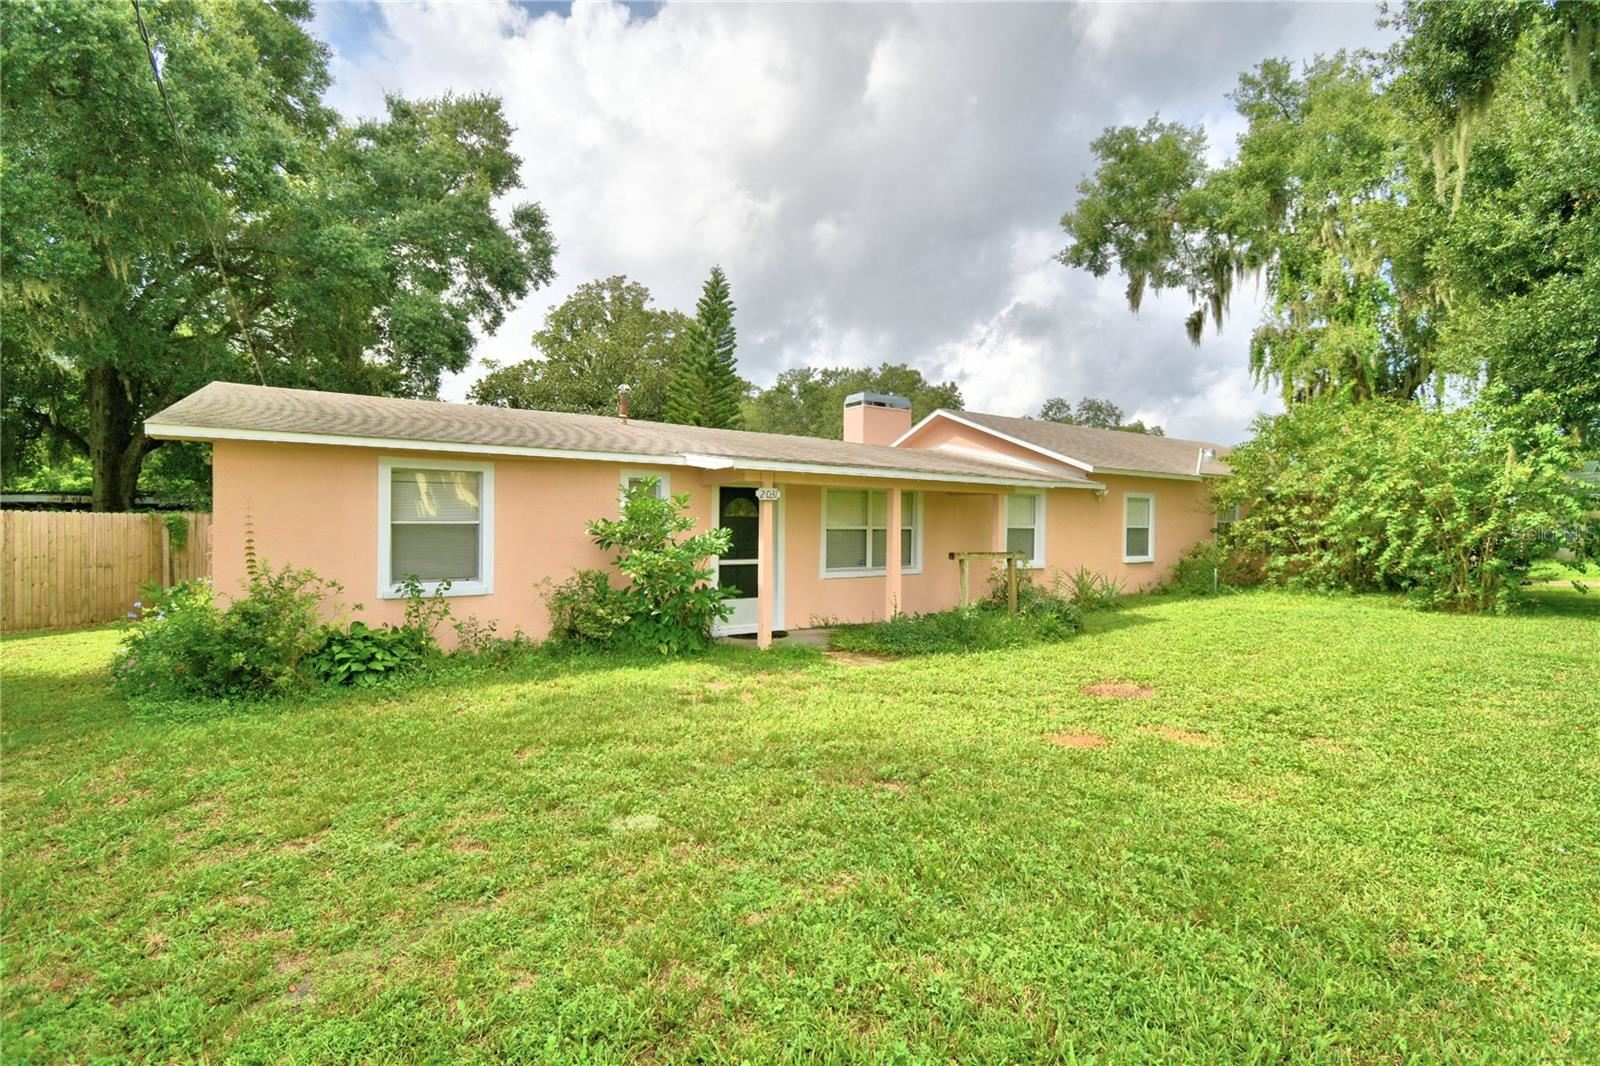 2031 POE STREET, Lakeland, FL 33801 - #: L4925280